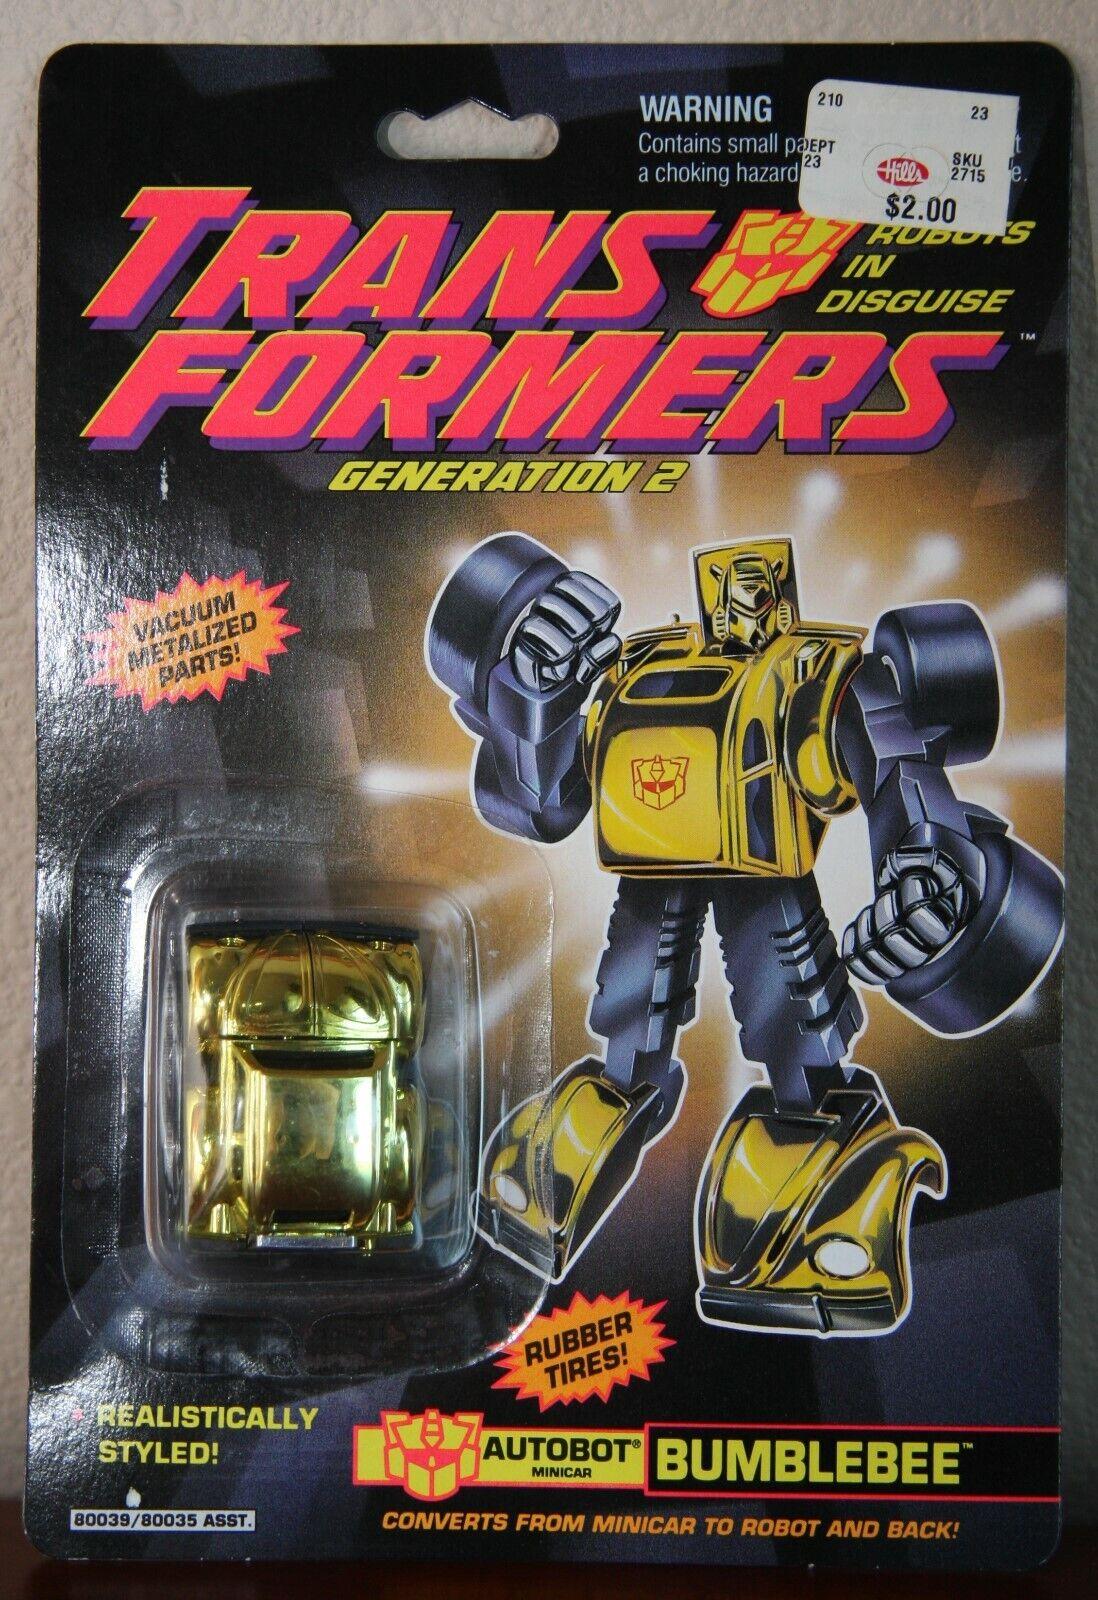 Transformers GENERATION 2 G2 MATT mettuttiica Bumblebee Autobot MOC NUOVO SIGILLATO